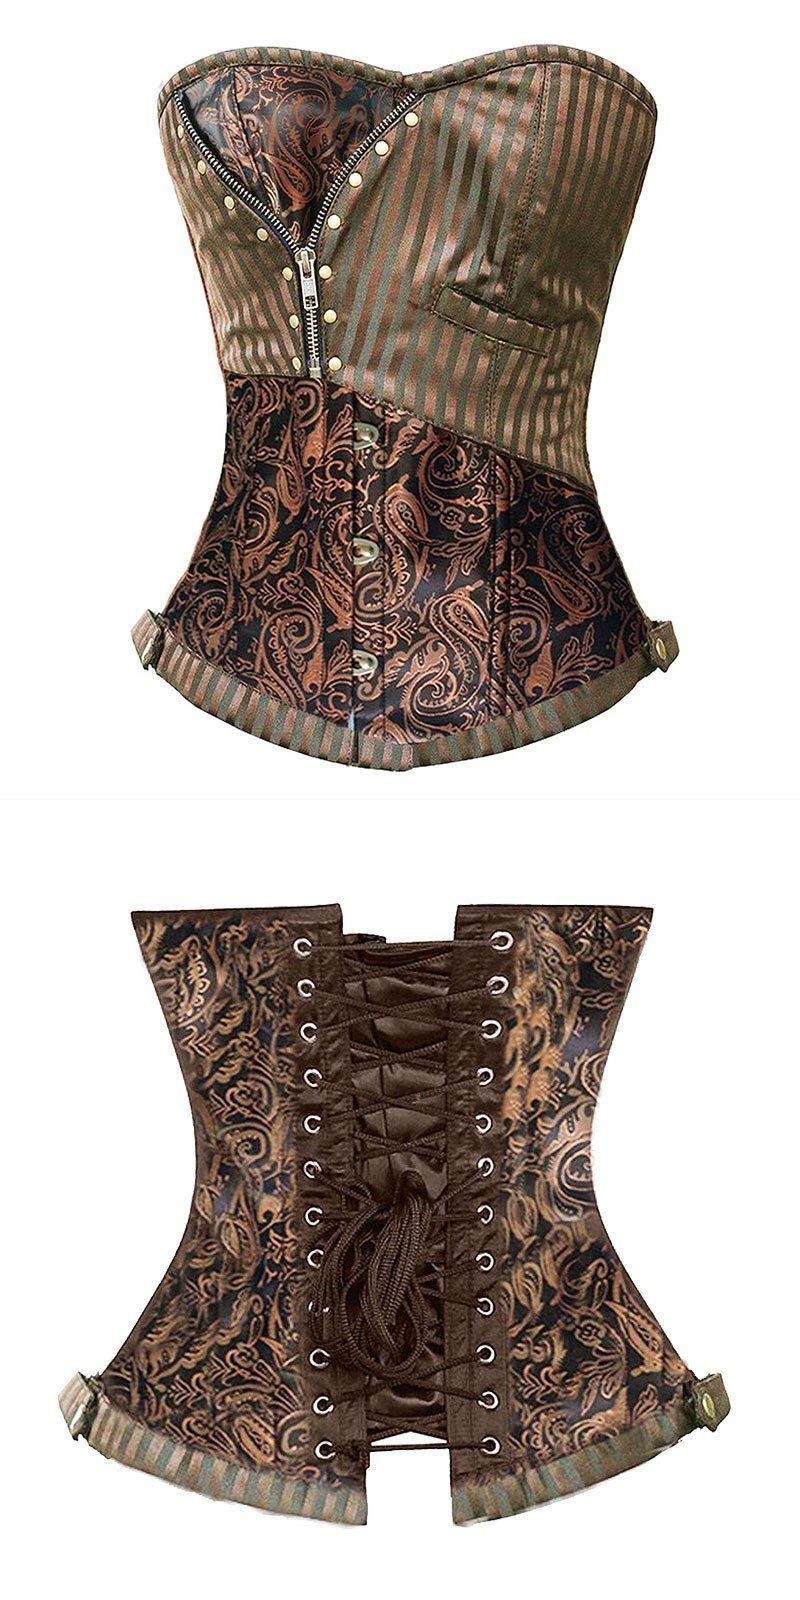 3232f8ad58 Helloween costumes sexy corsets and bustiers steampunk corset jpg 800x1600 Brocade  waist cincher